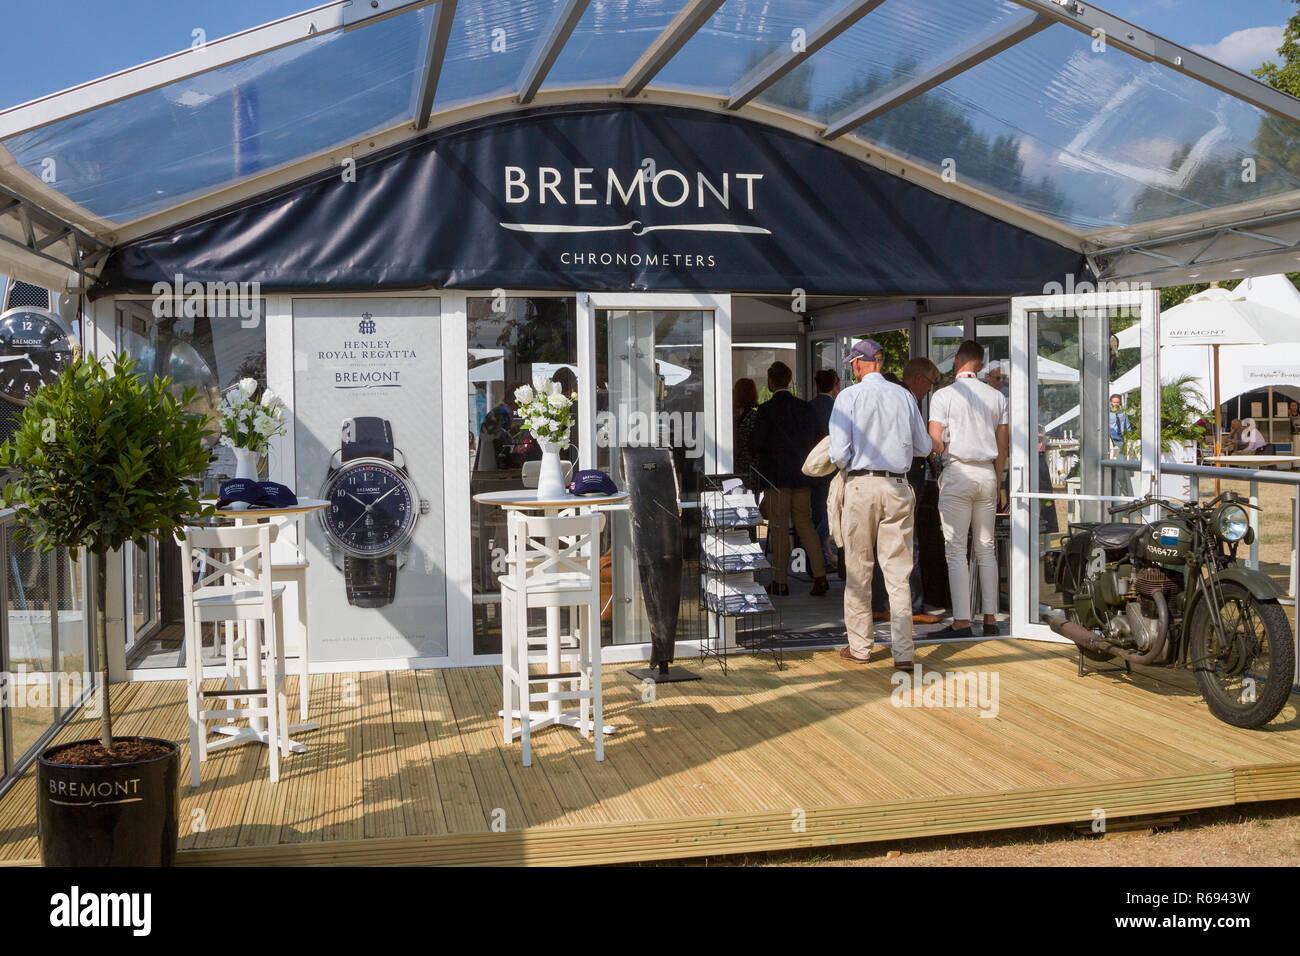 The Bremont Chronometers pavillion at Henley Royal Regatta - Stock Image